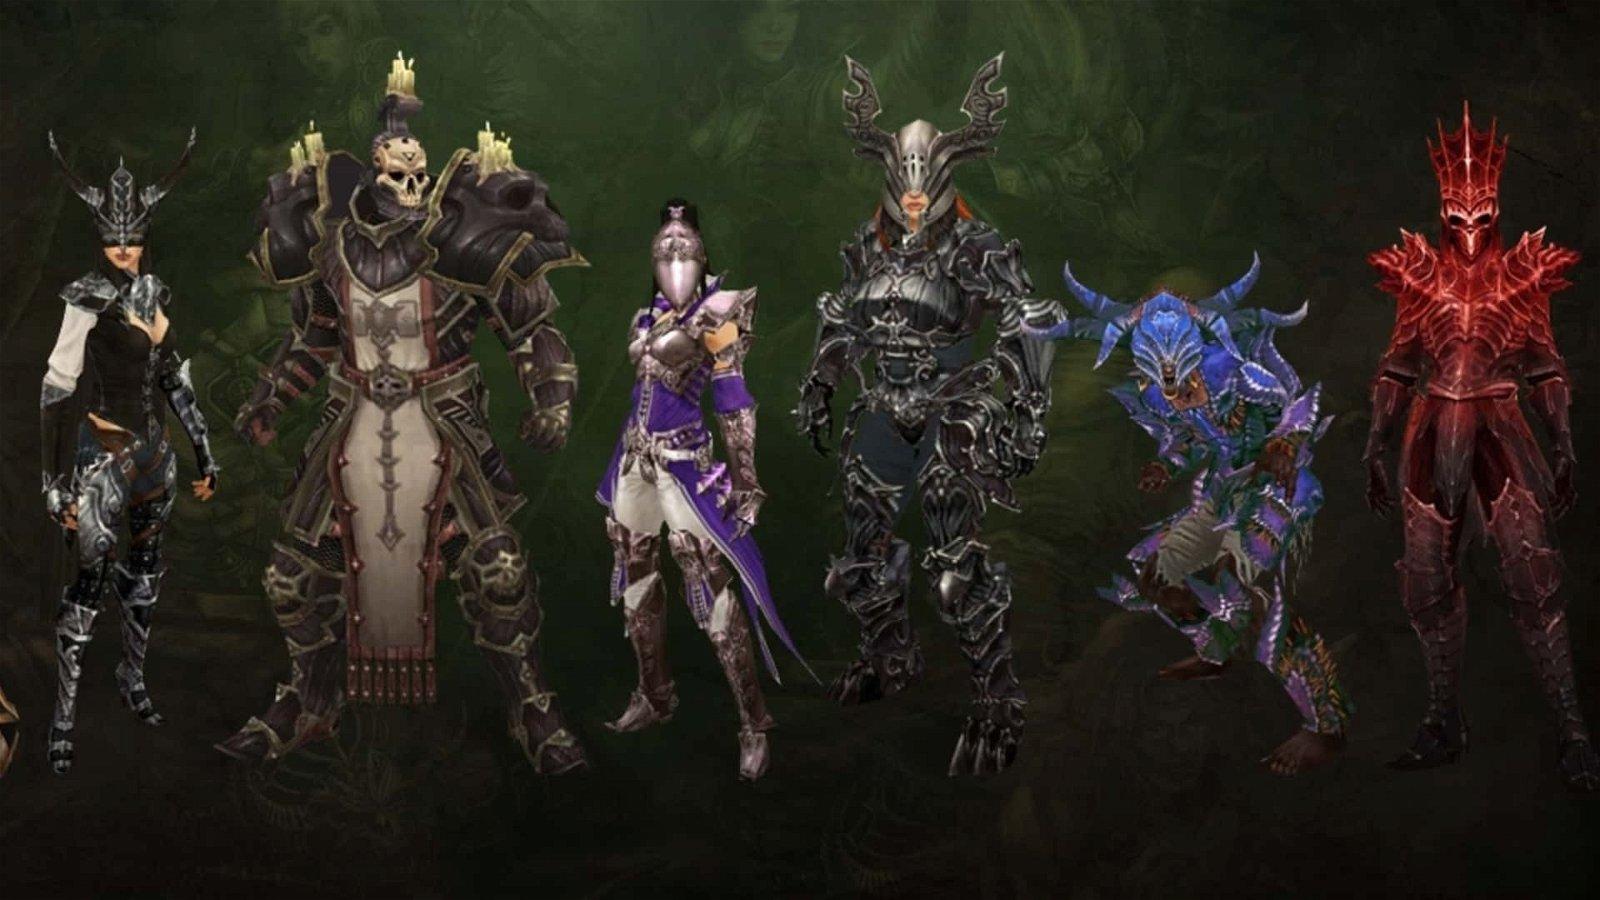 Diablo III Seasonal Update Brings New Cosmetic Items and Quality of Life Changes 1